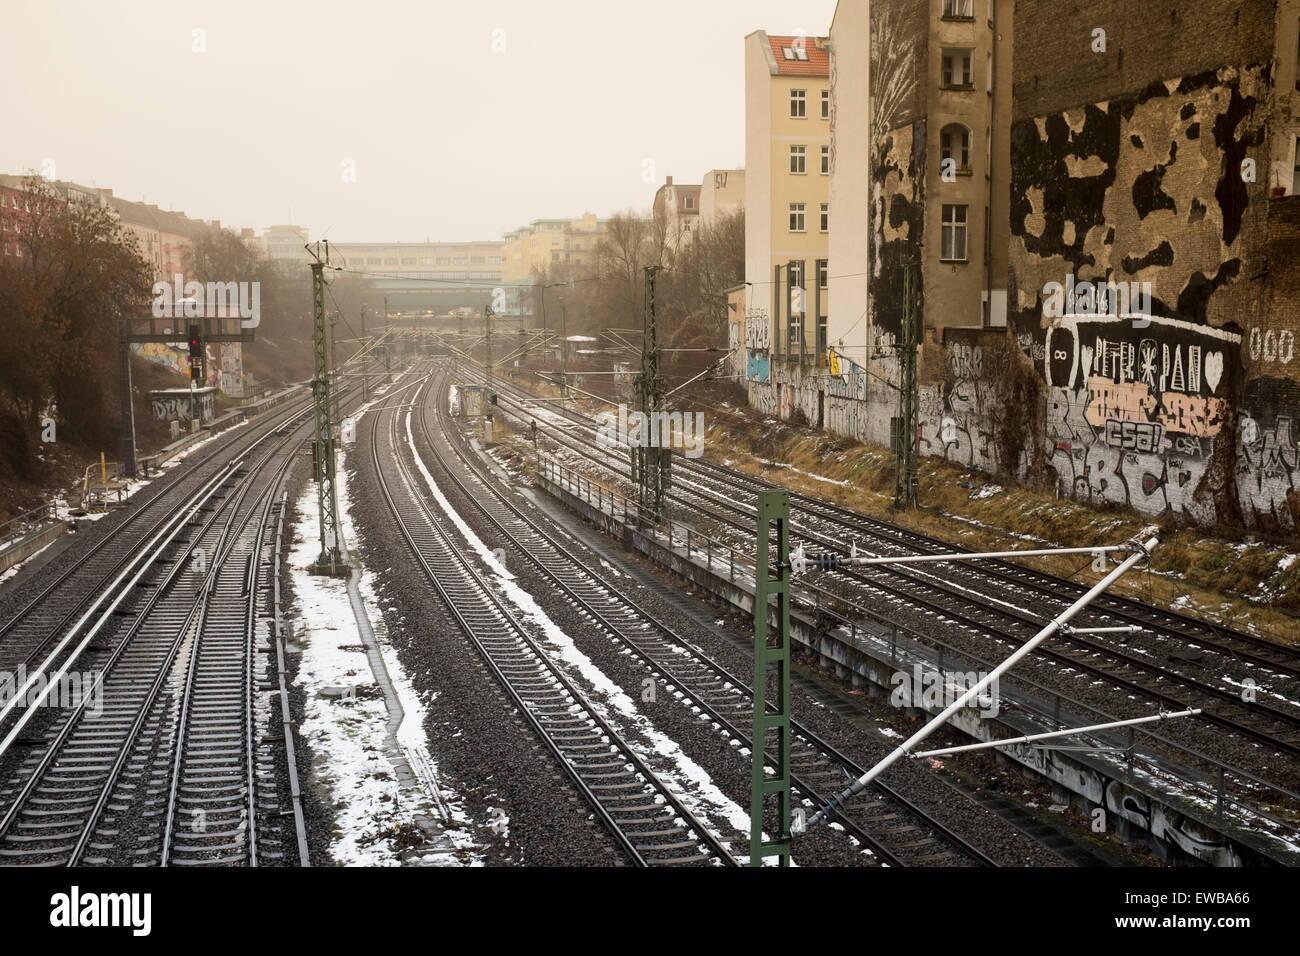 Railway tracks, Prenzlauer Berg, Berlin, Germany - Stock Image